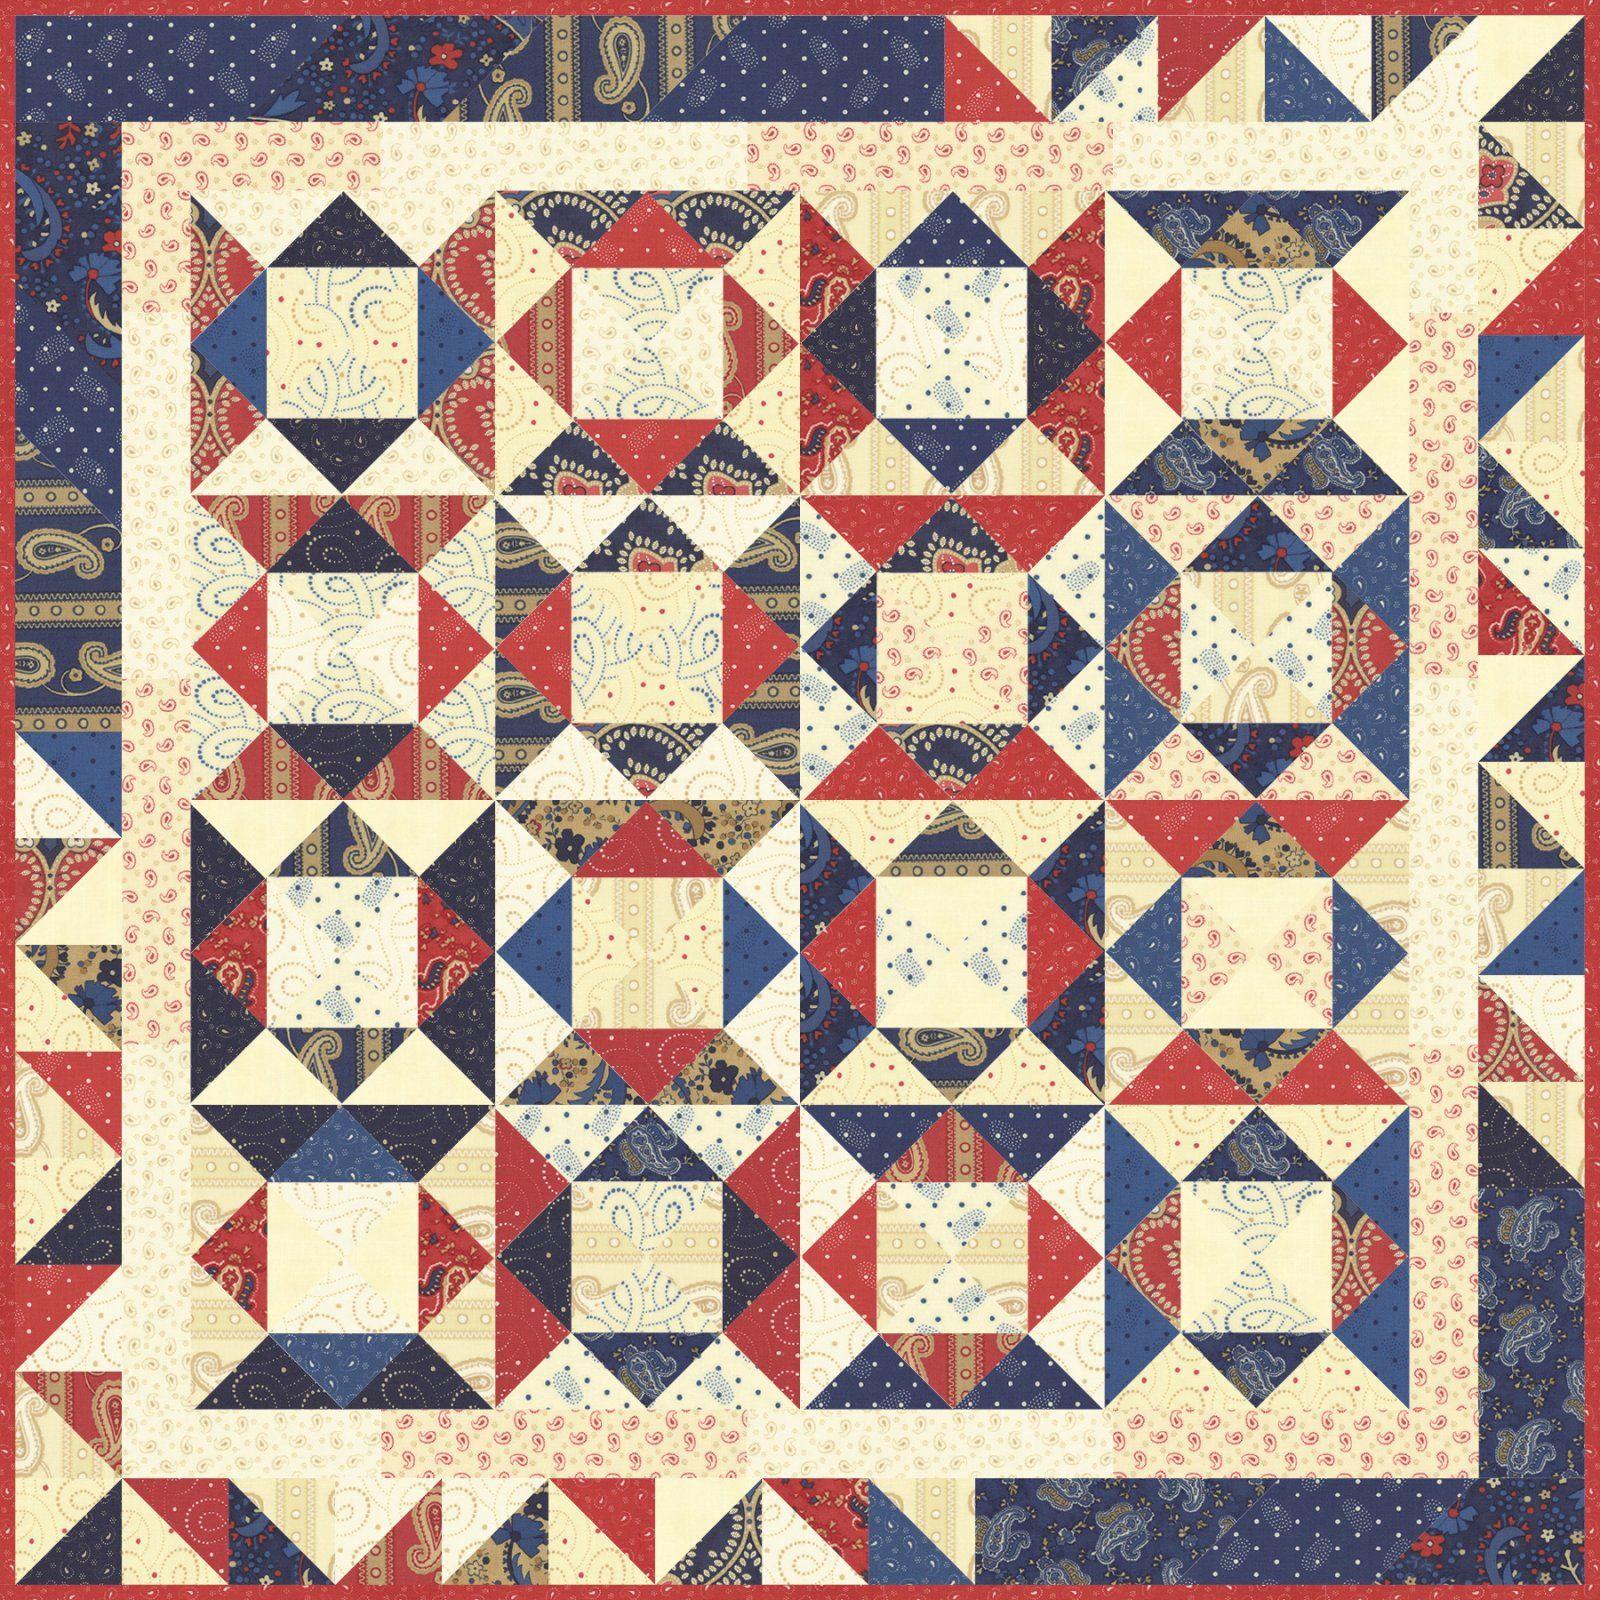 Moda Fabric Online Quilt Store Pre-Cut Fabric Kits & Patterns from ... : polka dot quilt pattern - Adamdwight.com